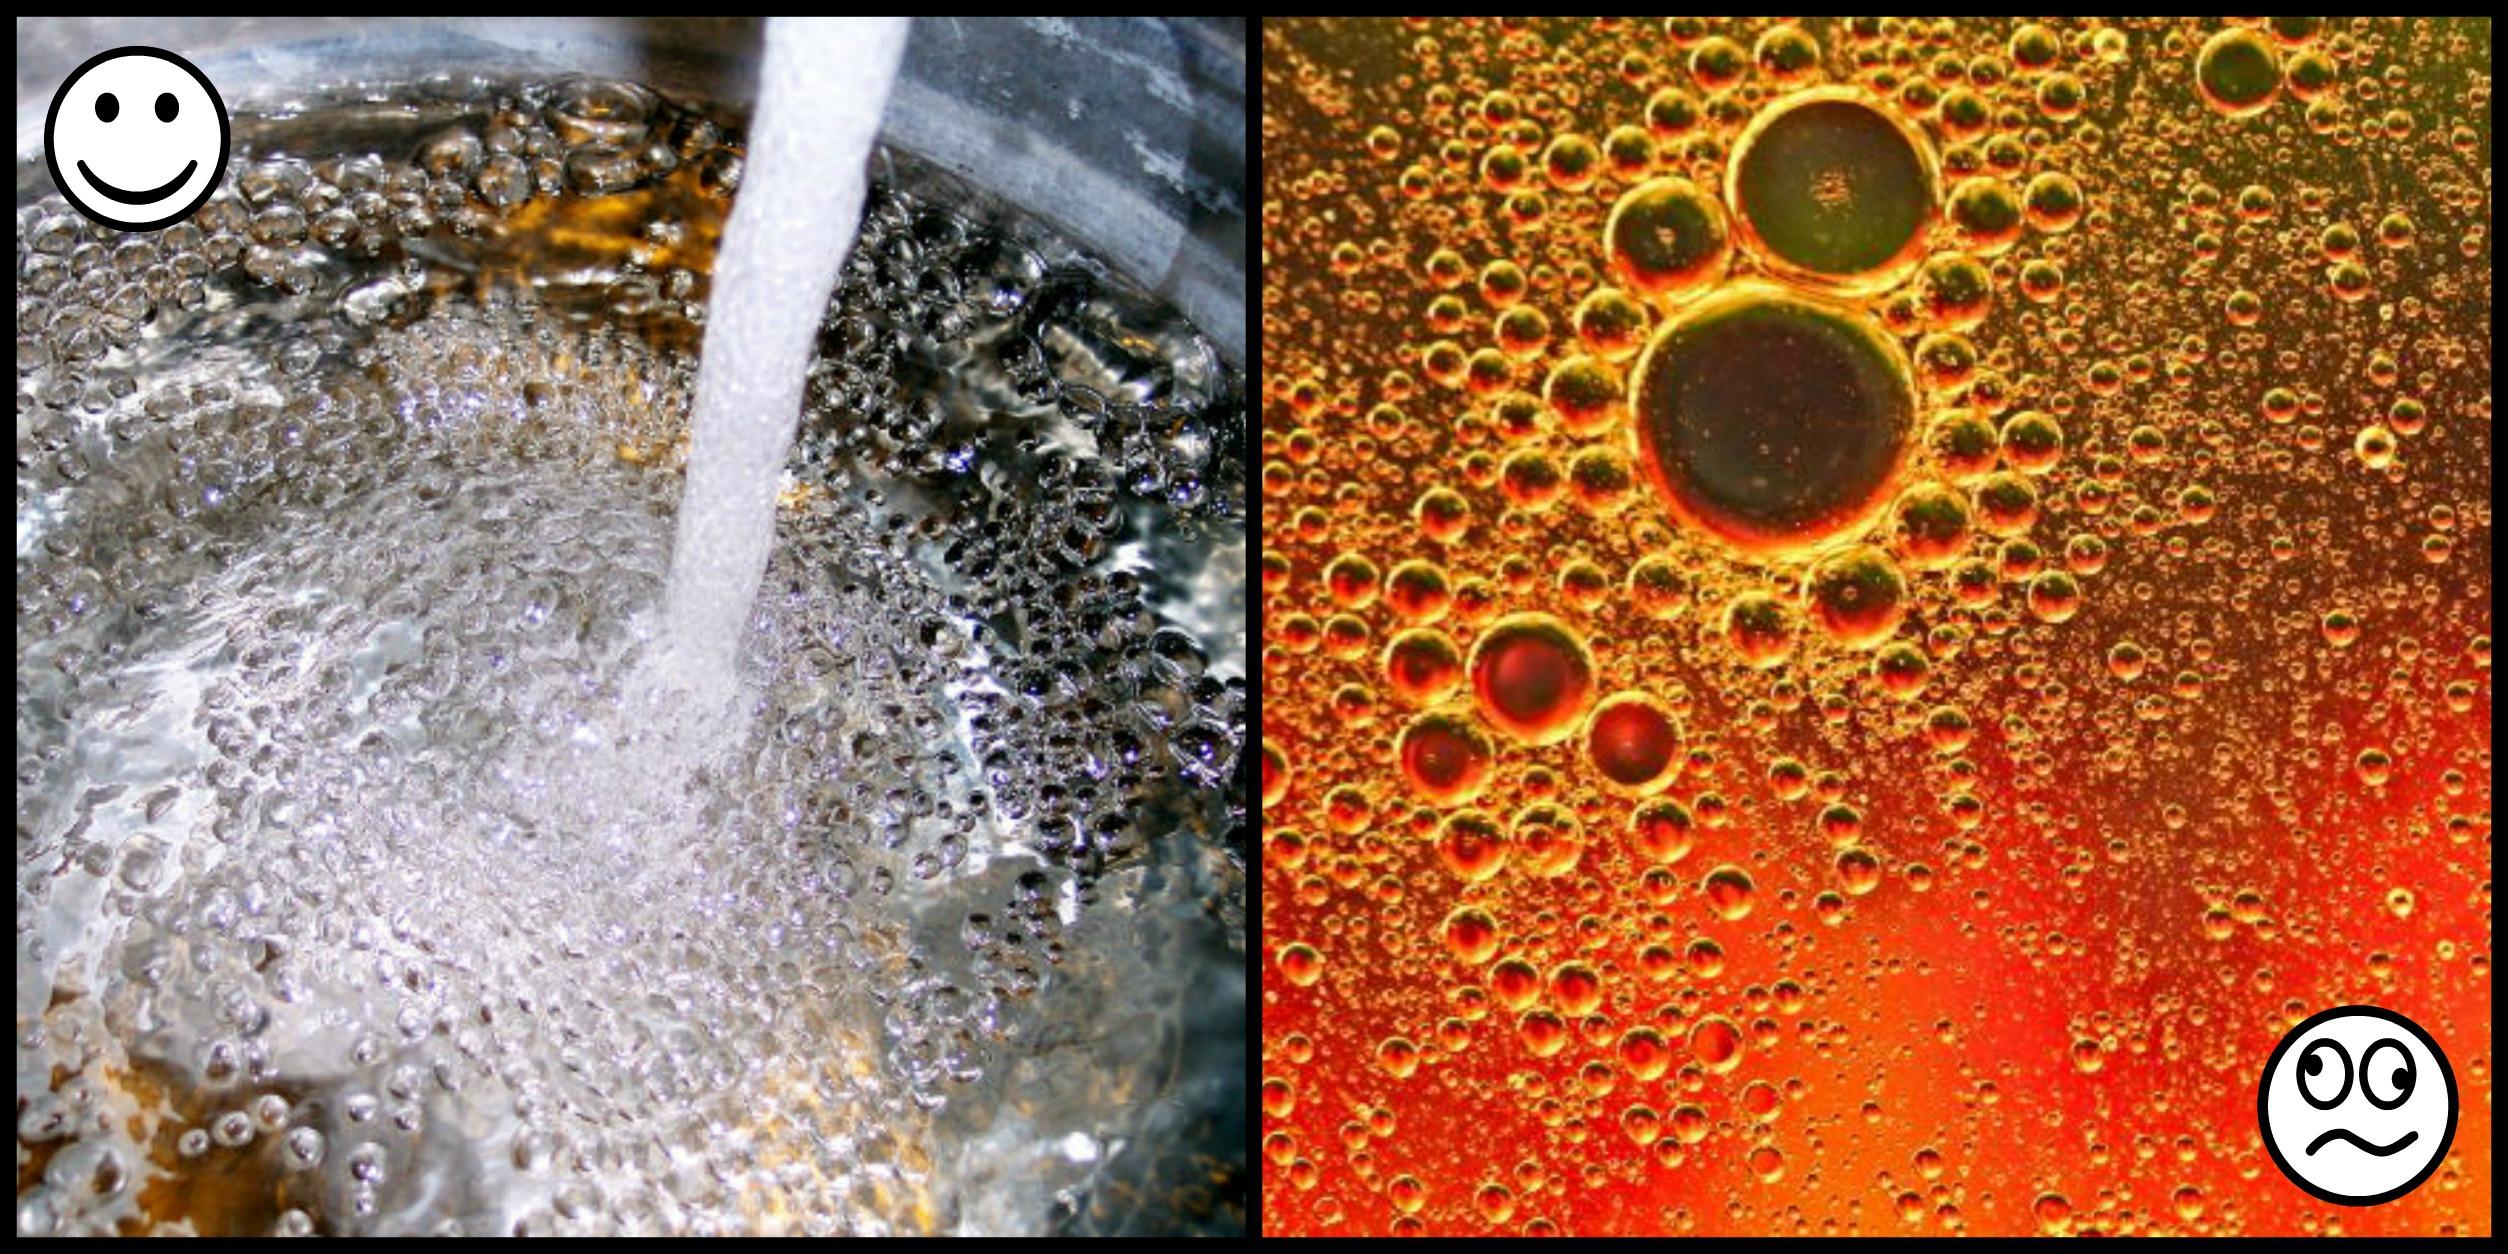 Vand versus olie